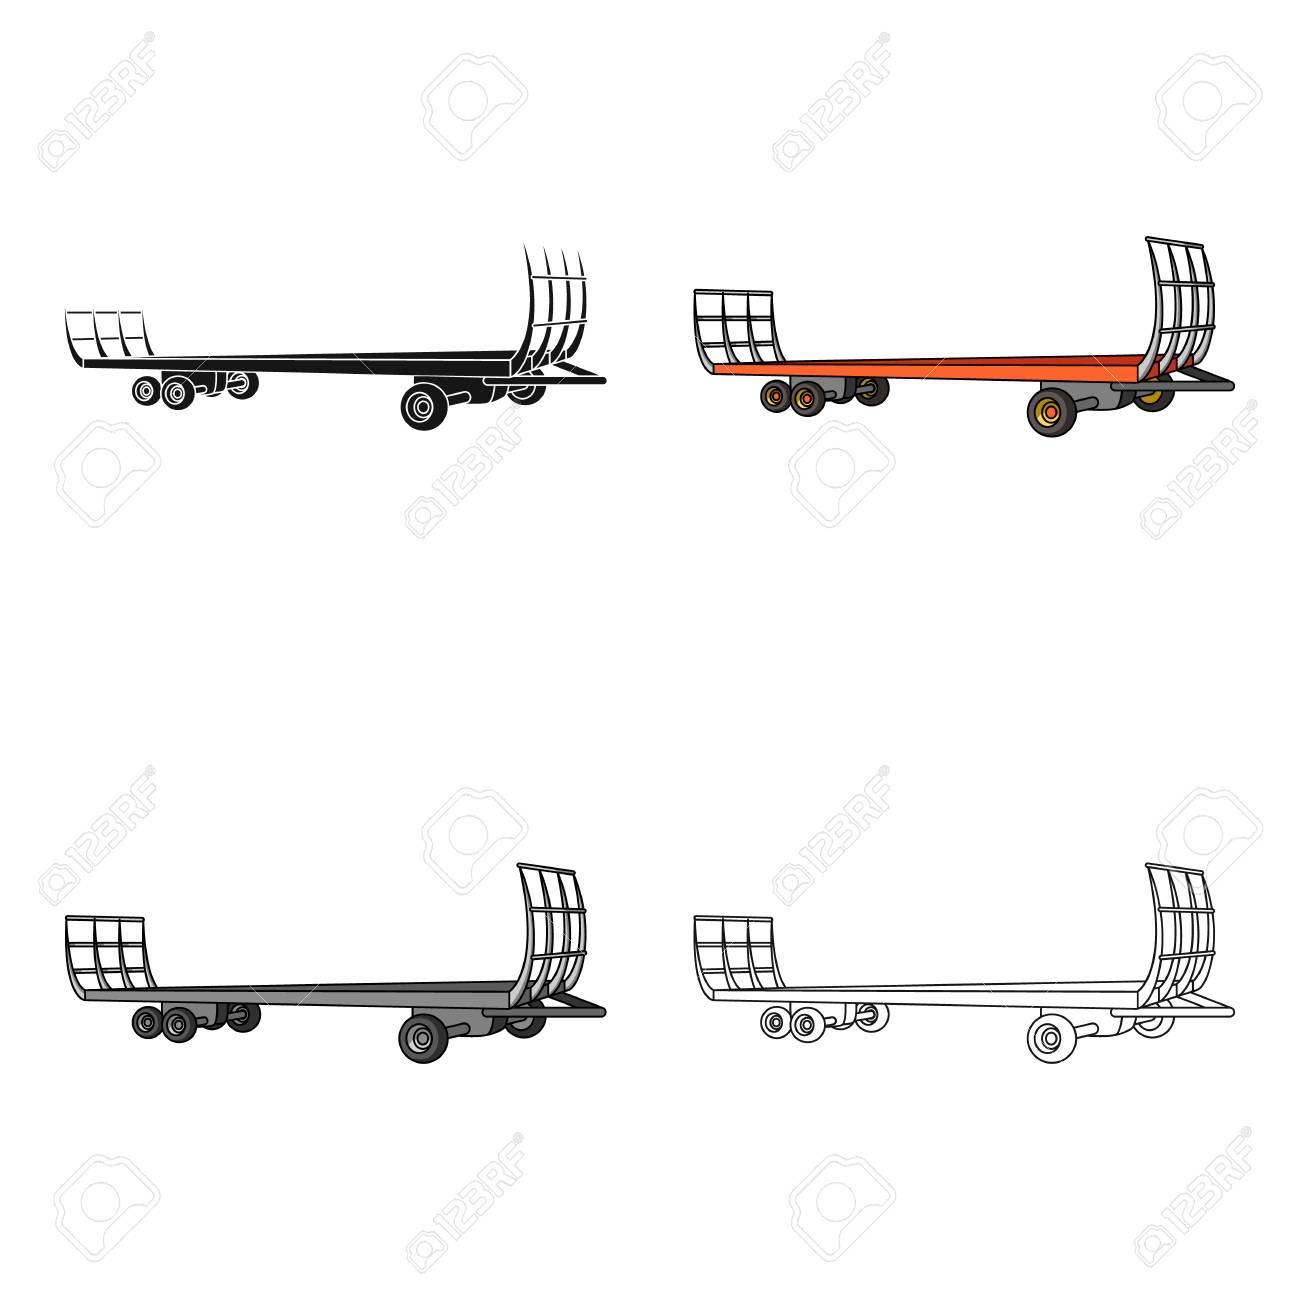 Specialized Trailer On Wheels For Trucks For Transportation Of